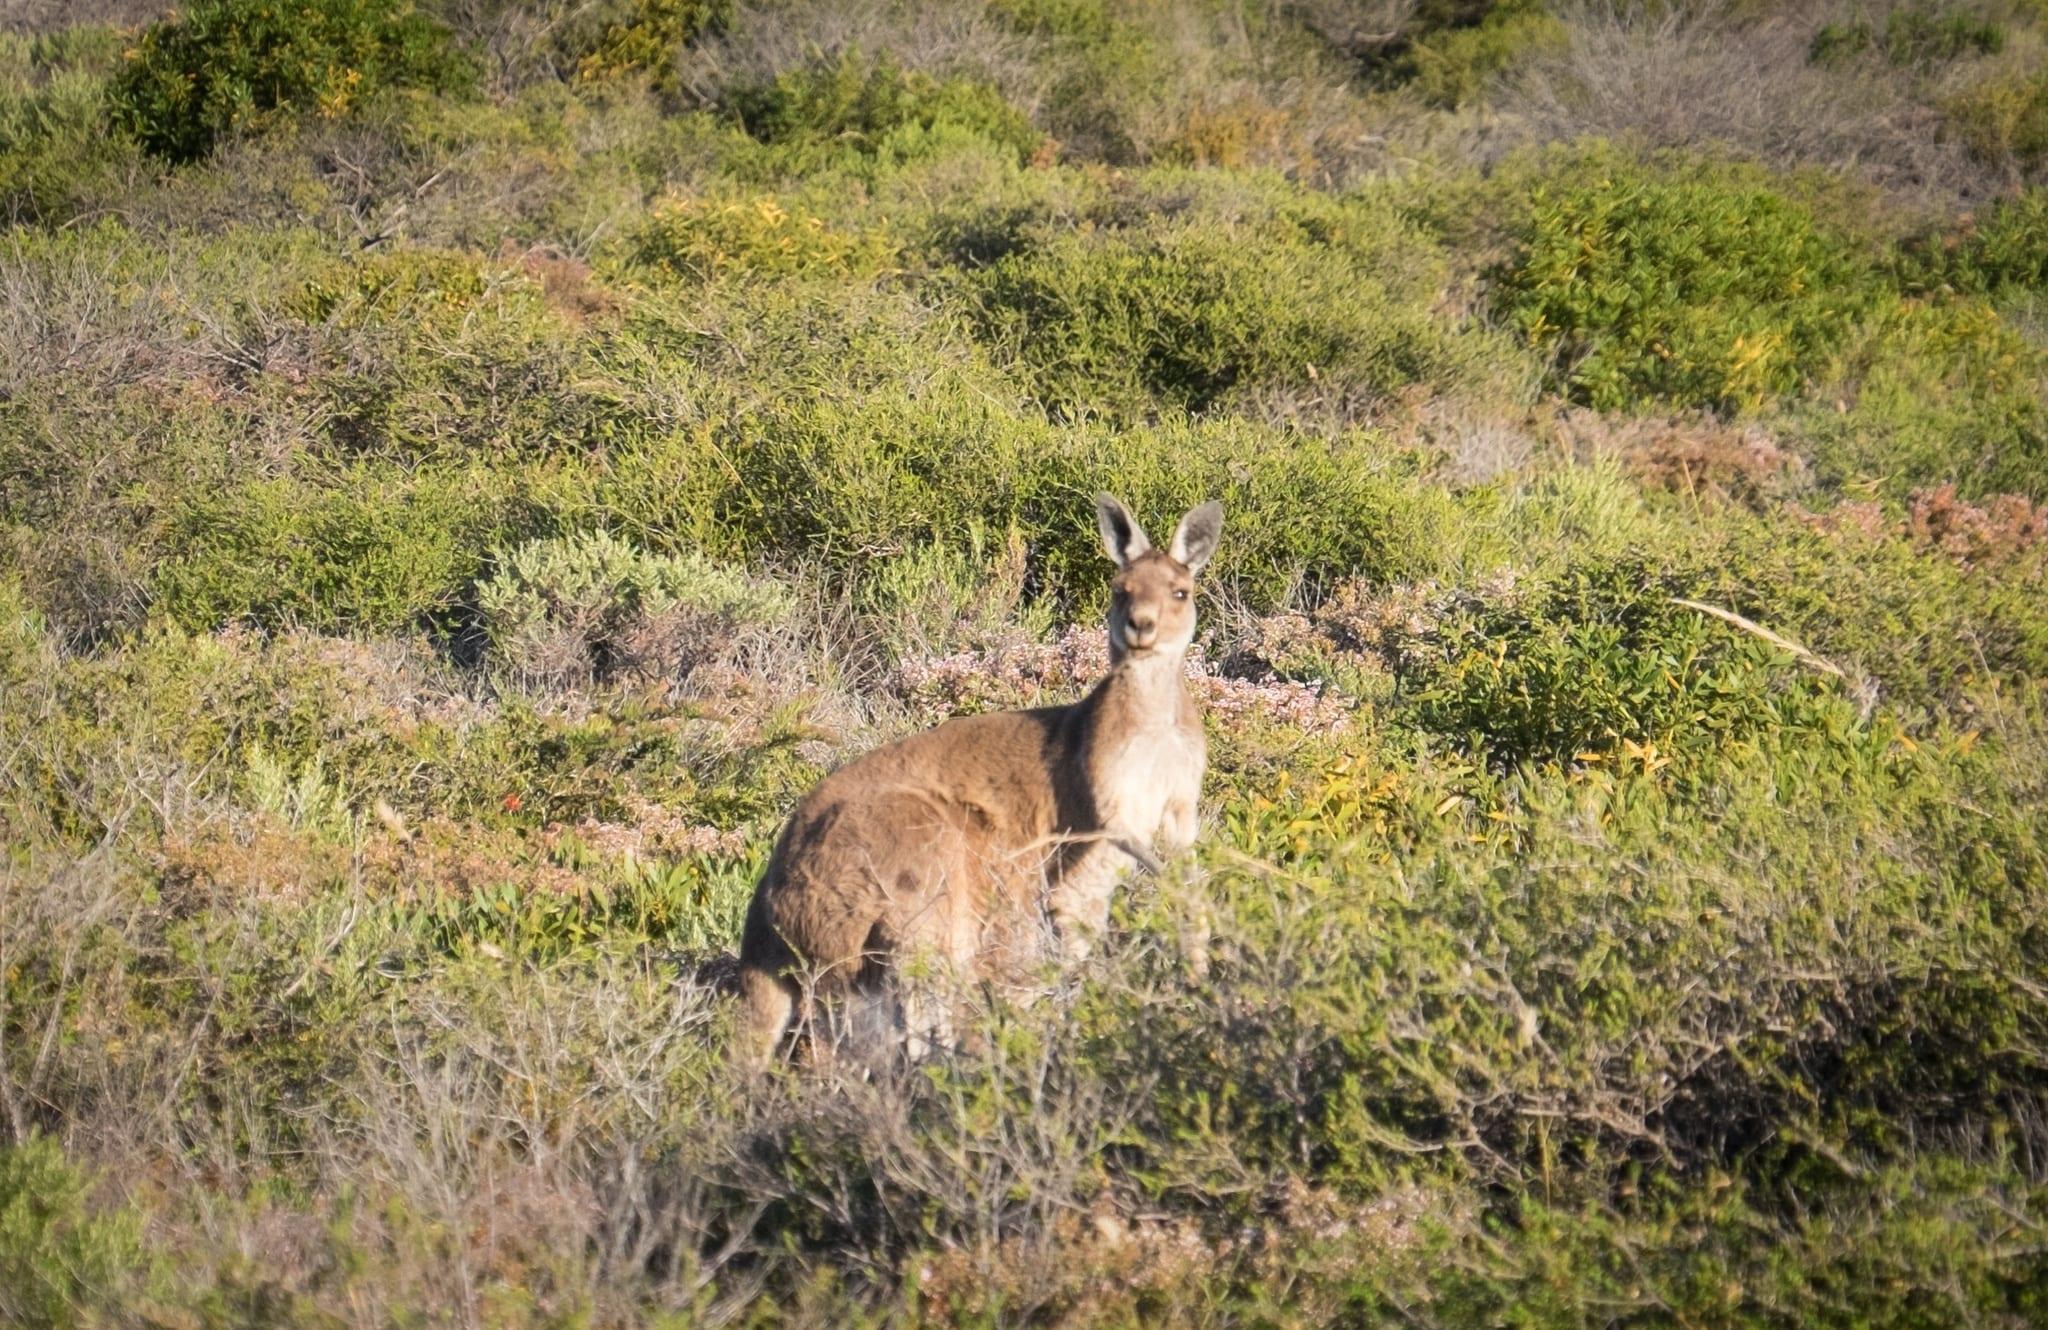 Kangaroo in Kalbarri